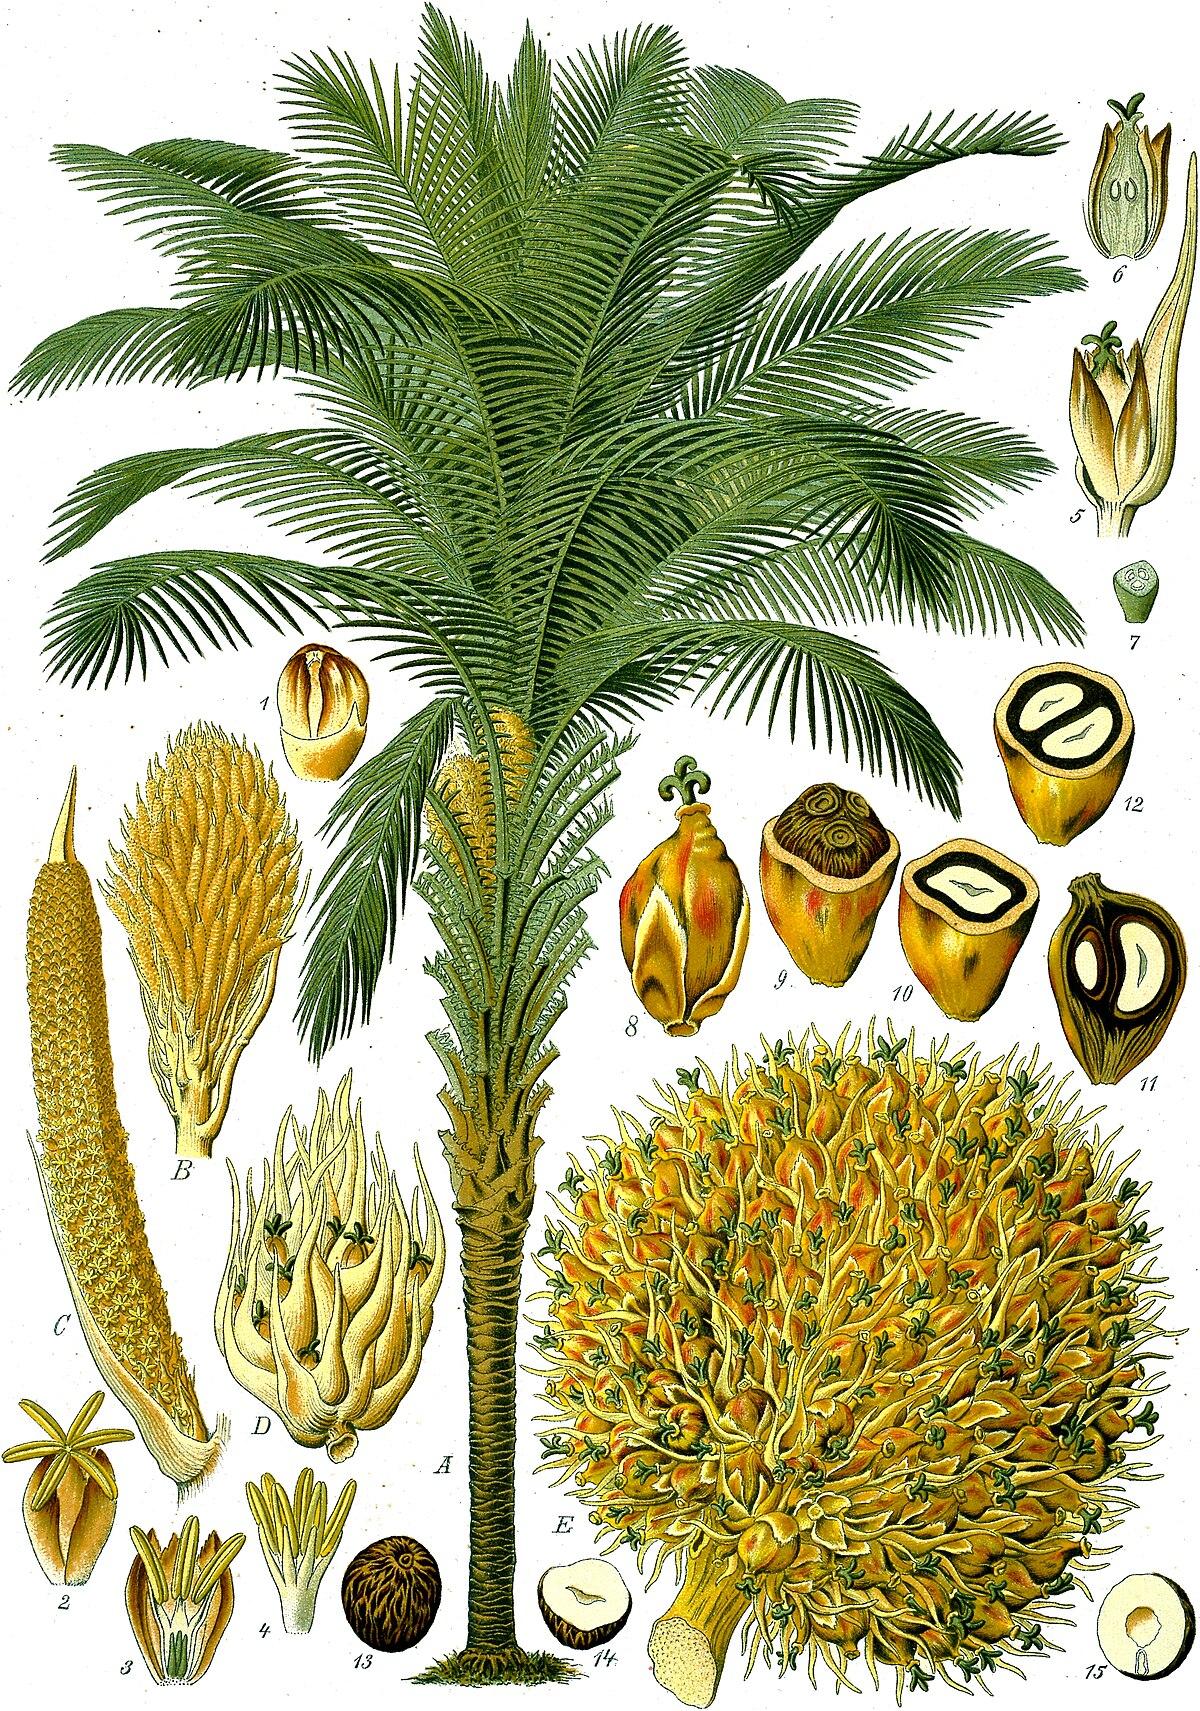 Christmas Palm - Gardening Solutions - University of Florida ...